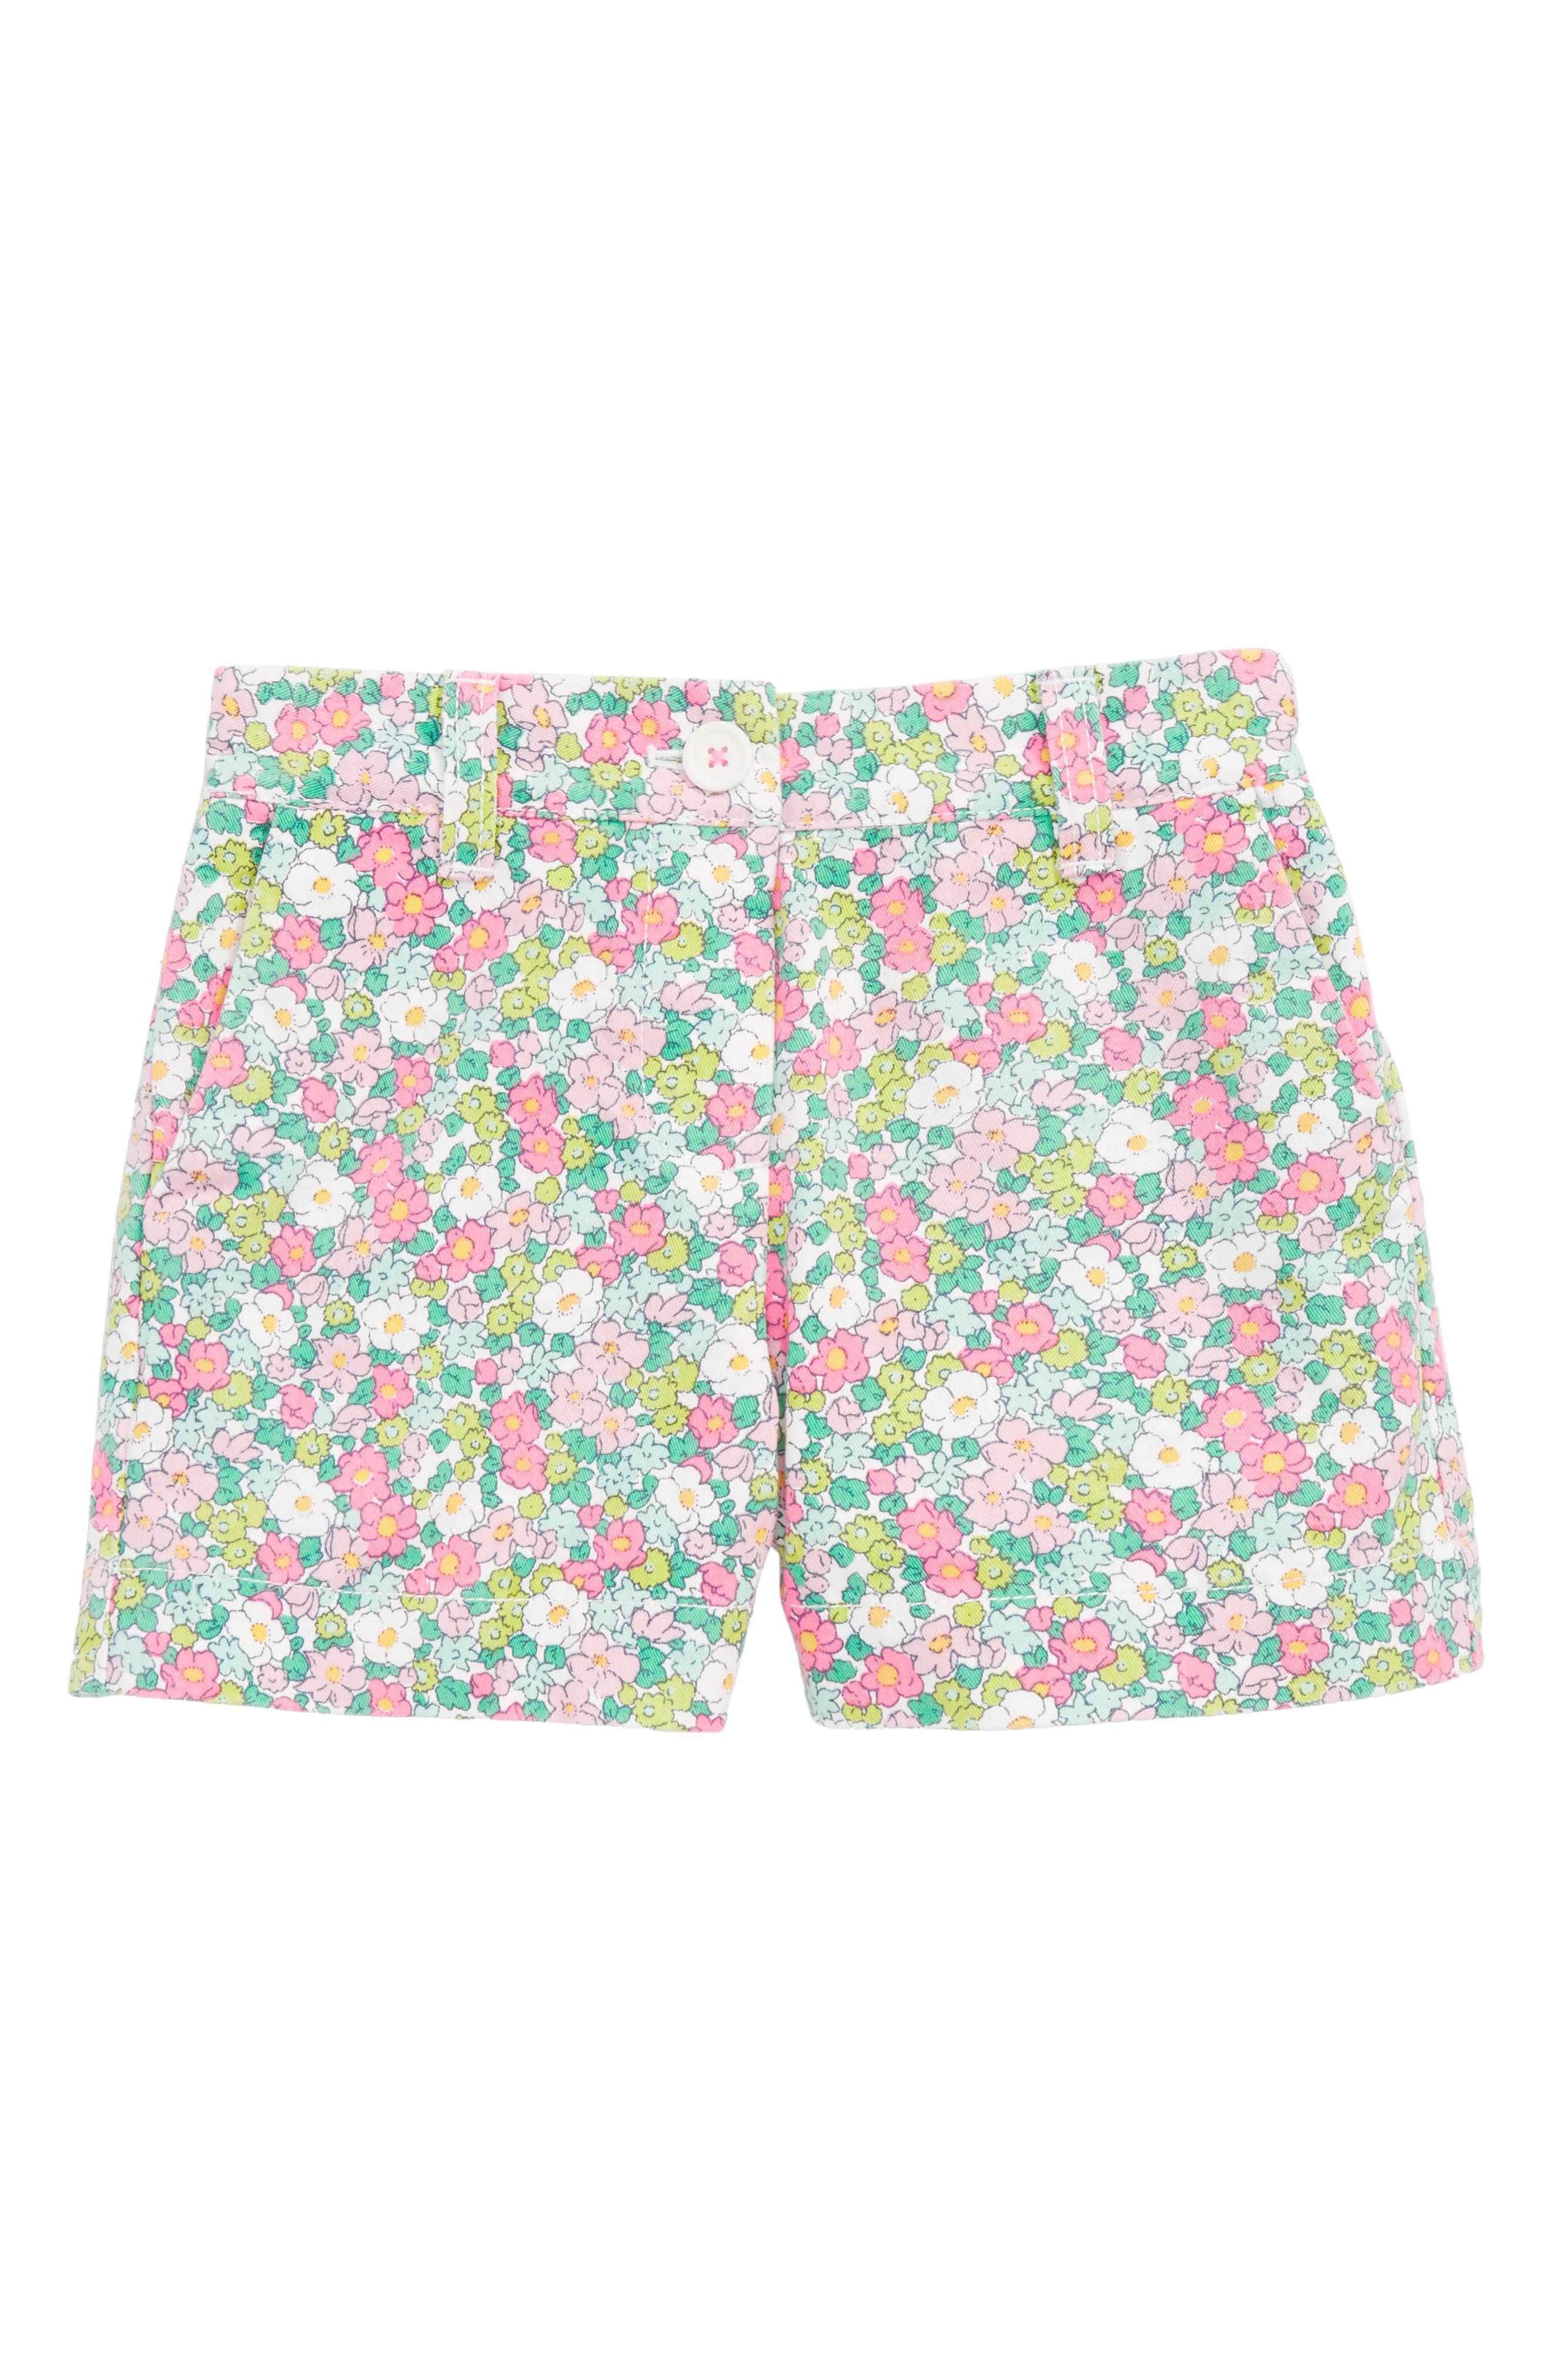 Bright Adventure Shorts,                         Main,                         color, 656